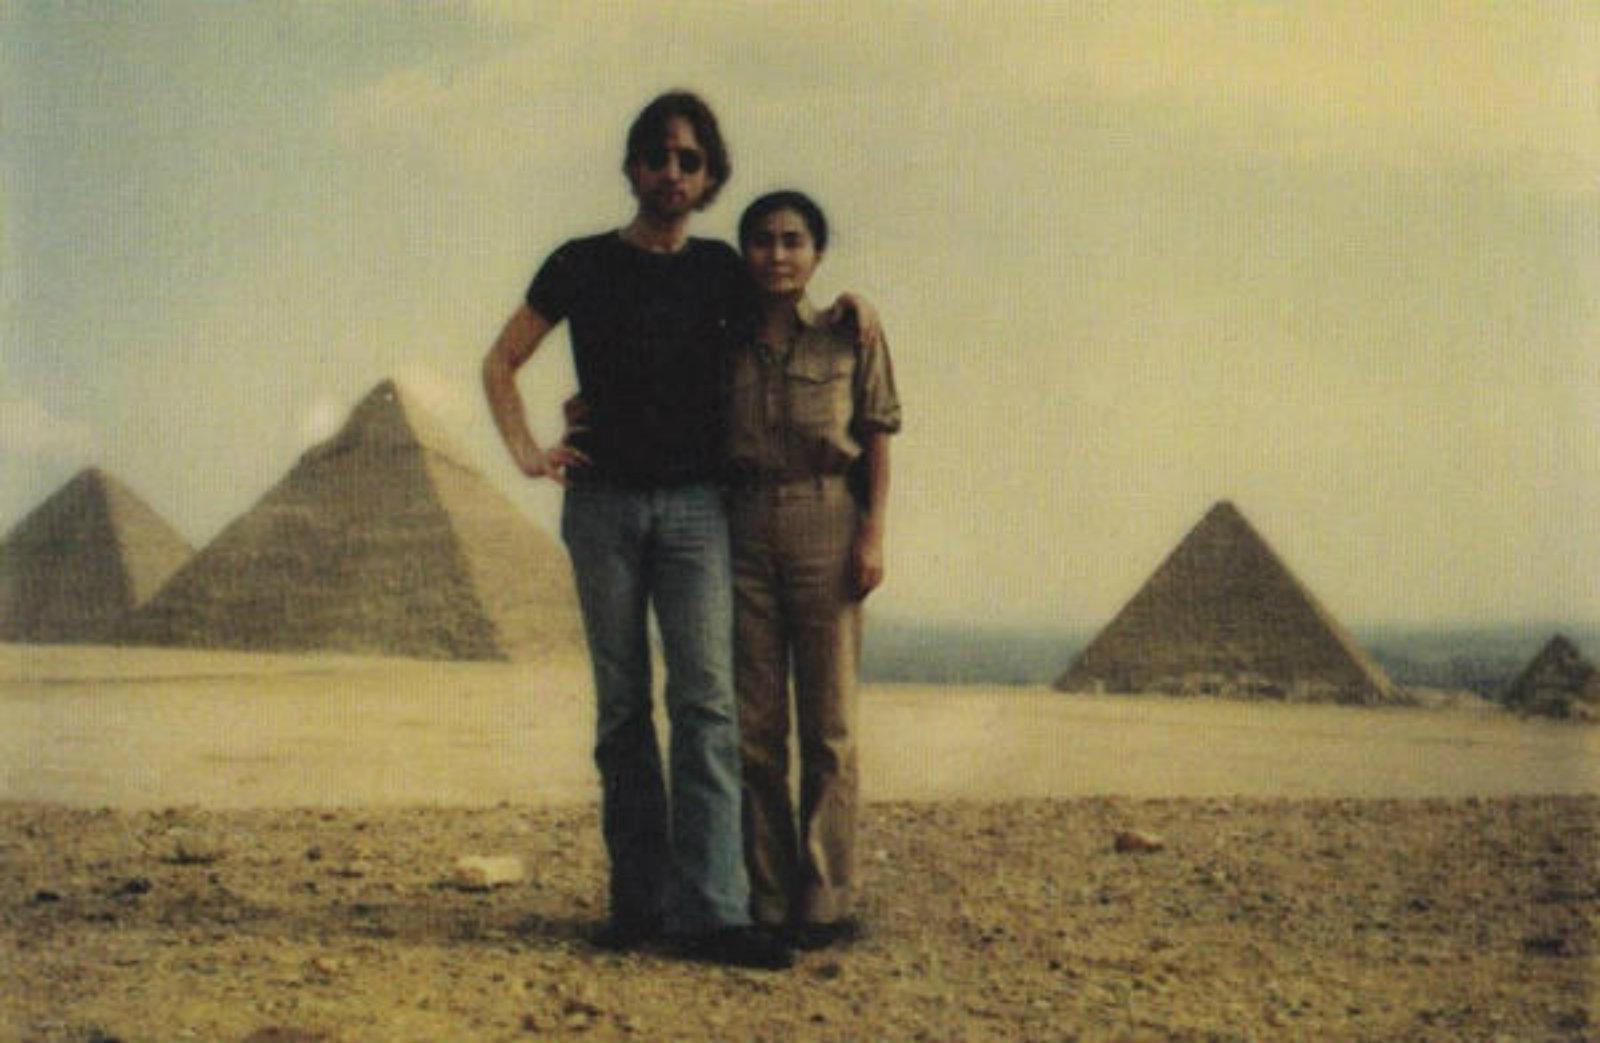 LennonOnoPyramids_web_1600.jpg